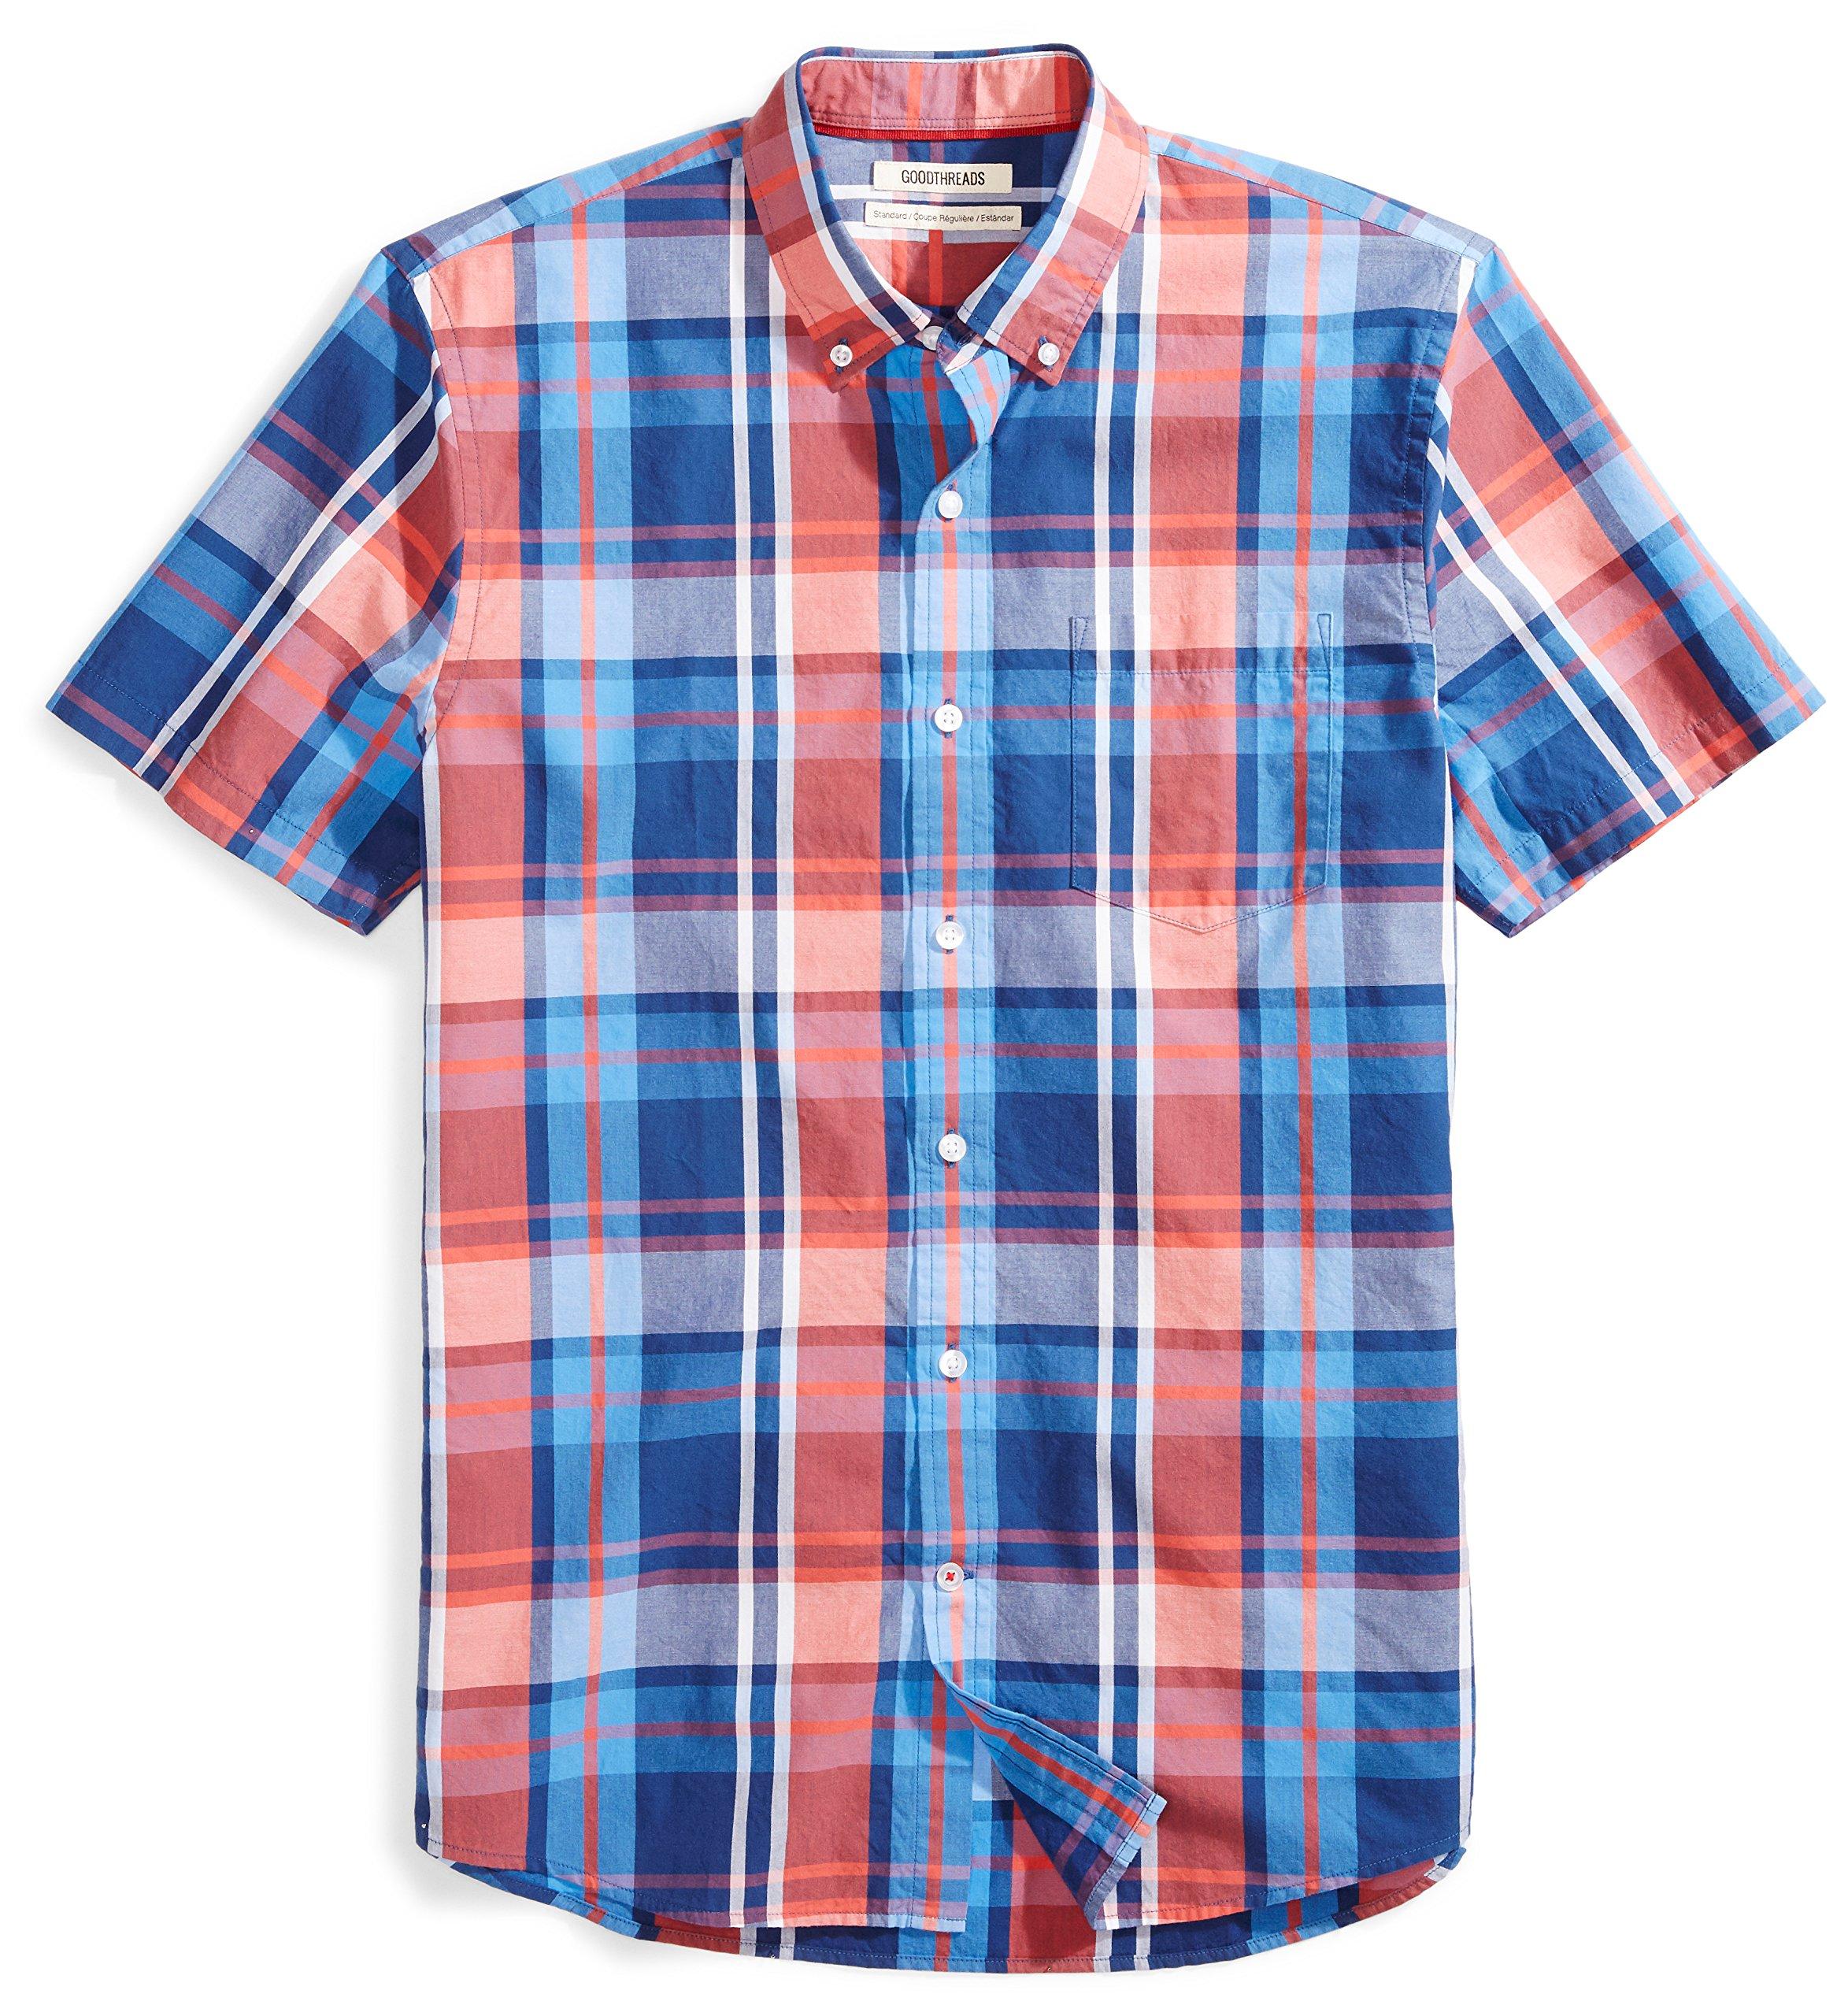 Goodthreads Men's Standard-Fit Short-Sleeve Large-Scale Plaid Shirt, Red/Blue, Large